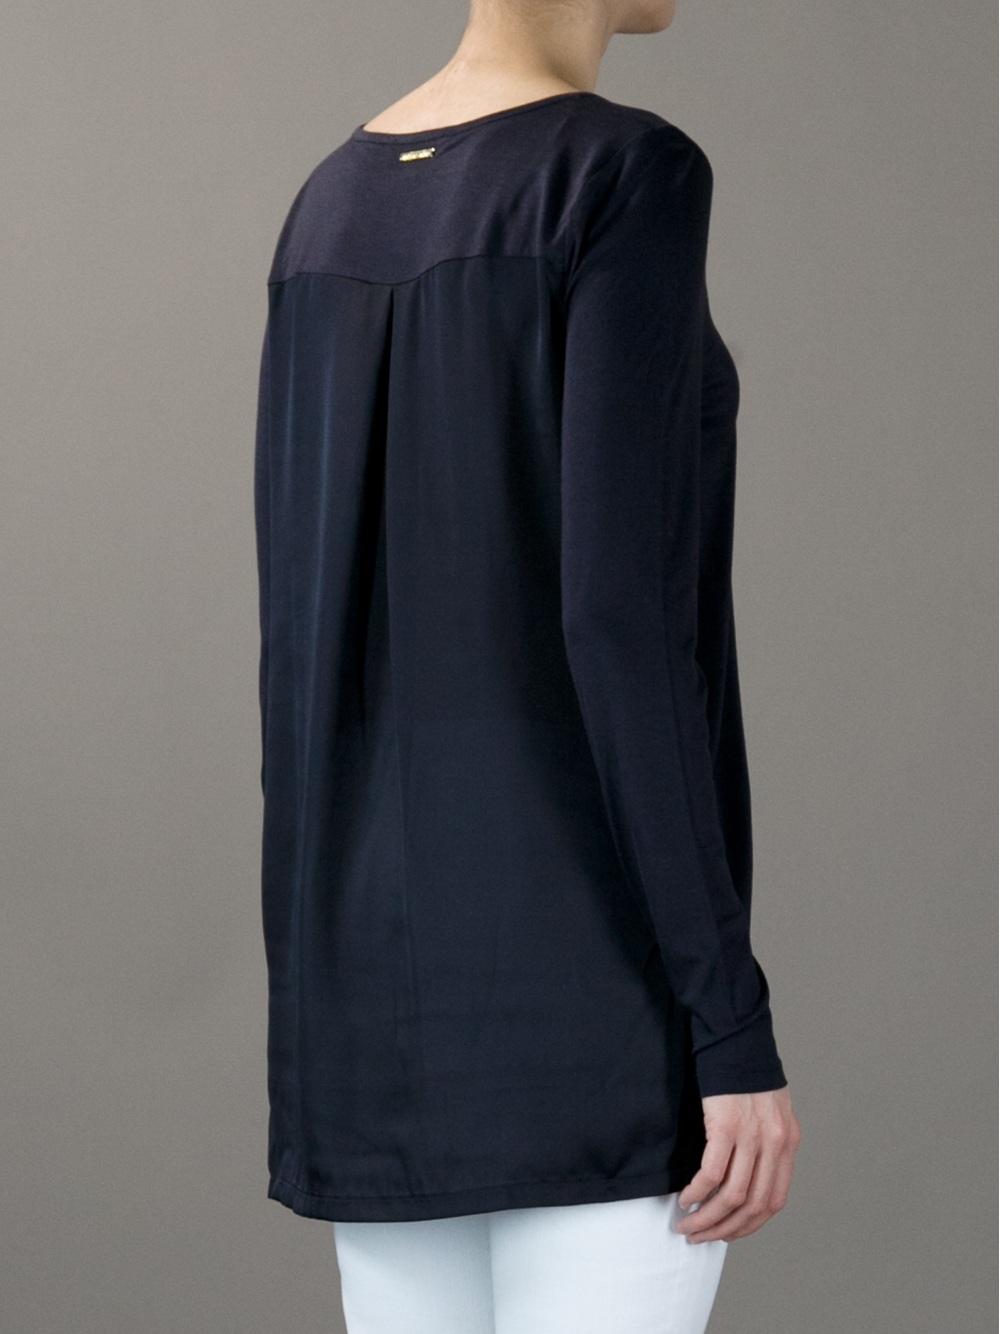 Michael kors long sleeve t shirt in blue black lyst for Black and blue long sleeve shirt